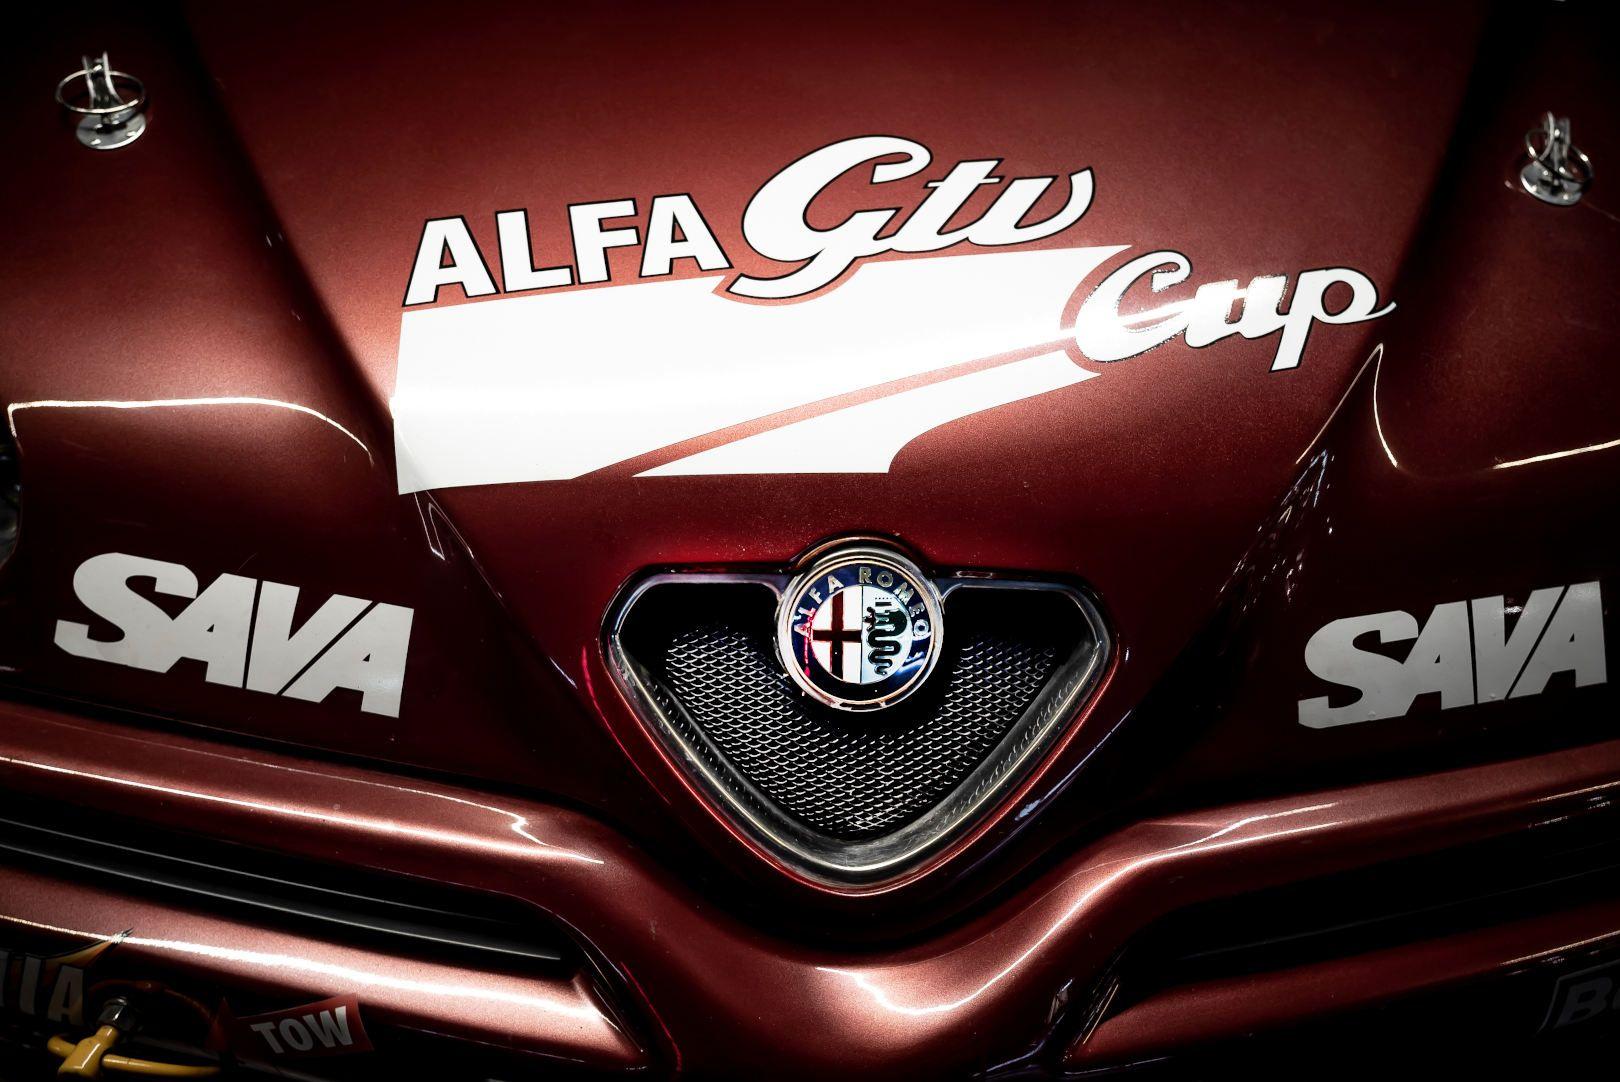 1995 Alfa Romeo GTV 2.0 V6 Turbo Cup Replica 57181